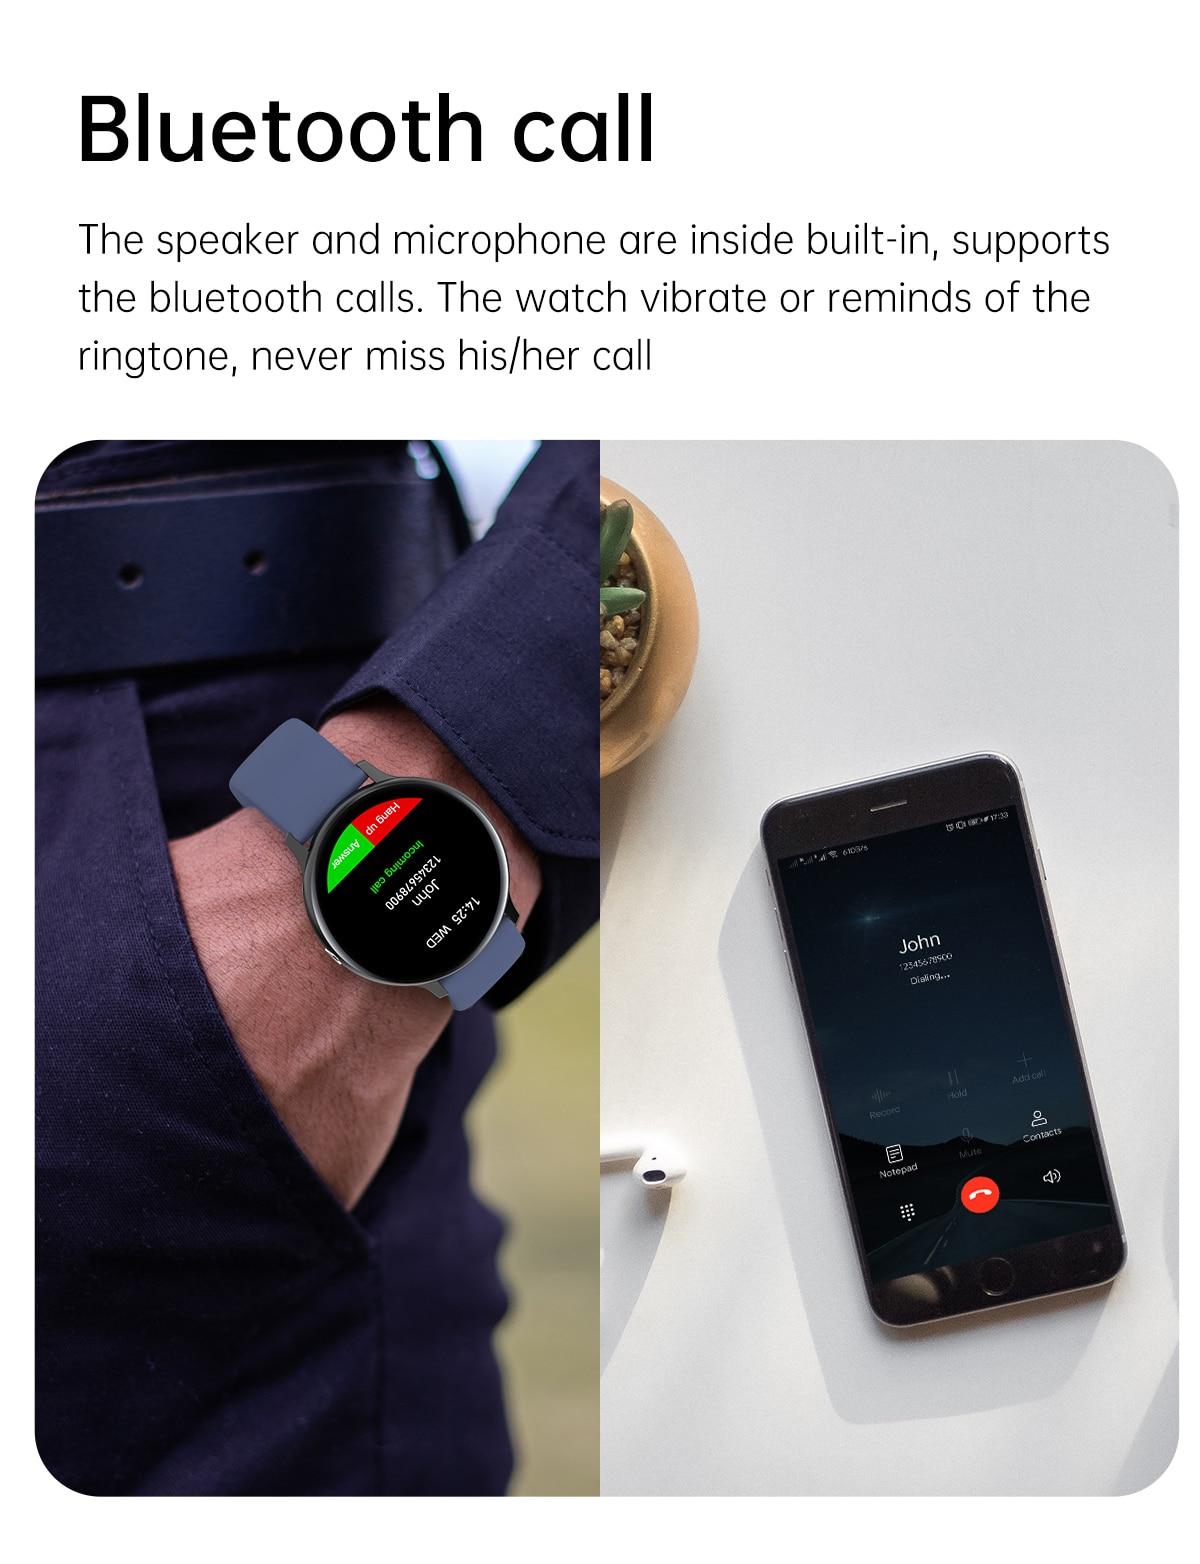 H574af041b5954e2dbd9718b8a6a3d19fJ LIGE 2021 Bluetooth Answer Call Smart Watch Men Full Touch Dial Call Fitness Tracker IP67 Waterproof 4G ROM Smartwatch for women